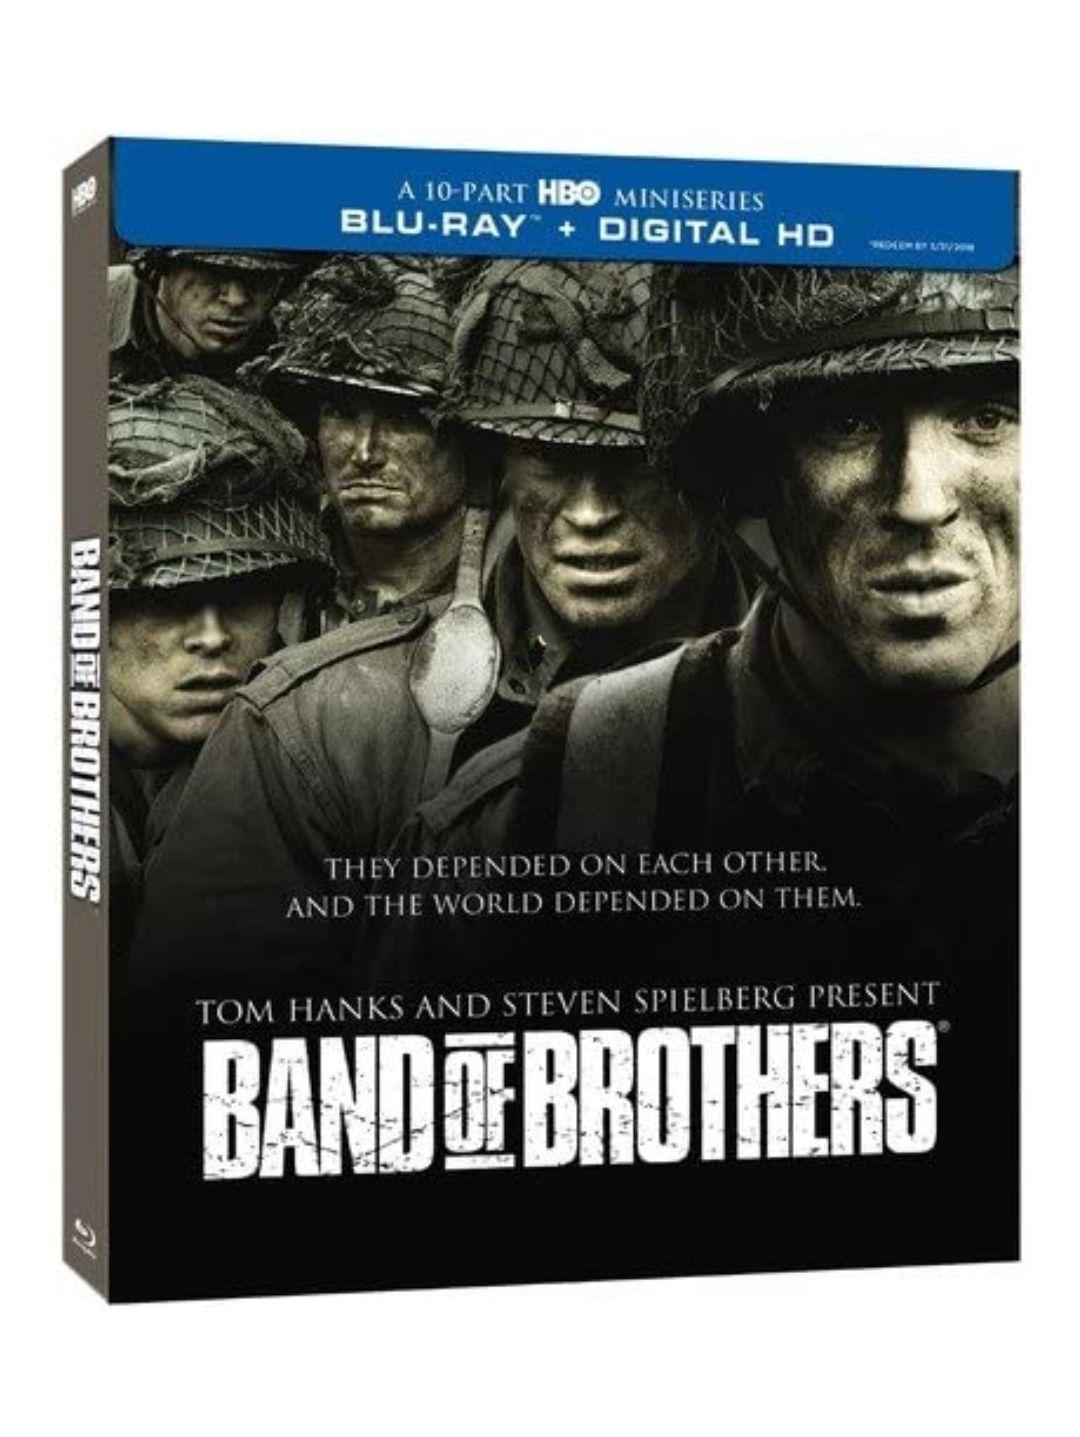 Amazon: serie Band of Brothers en blu-ray